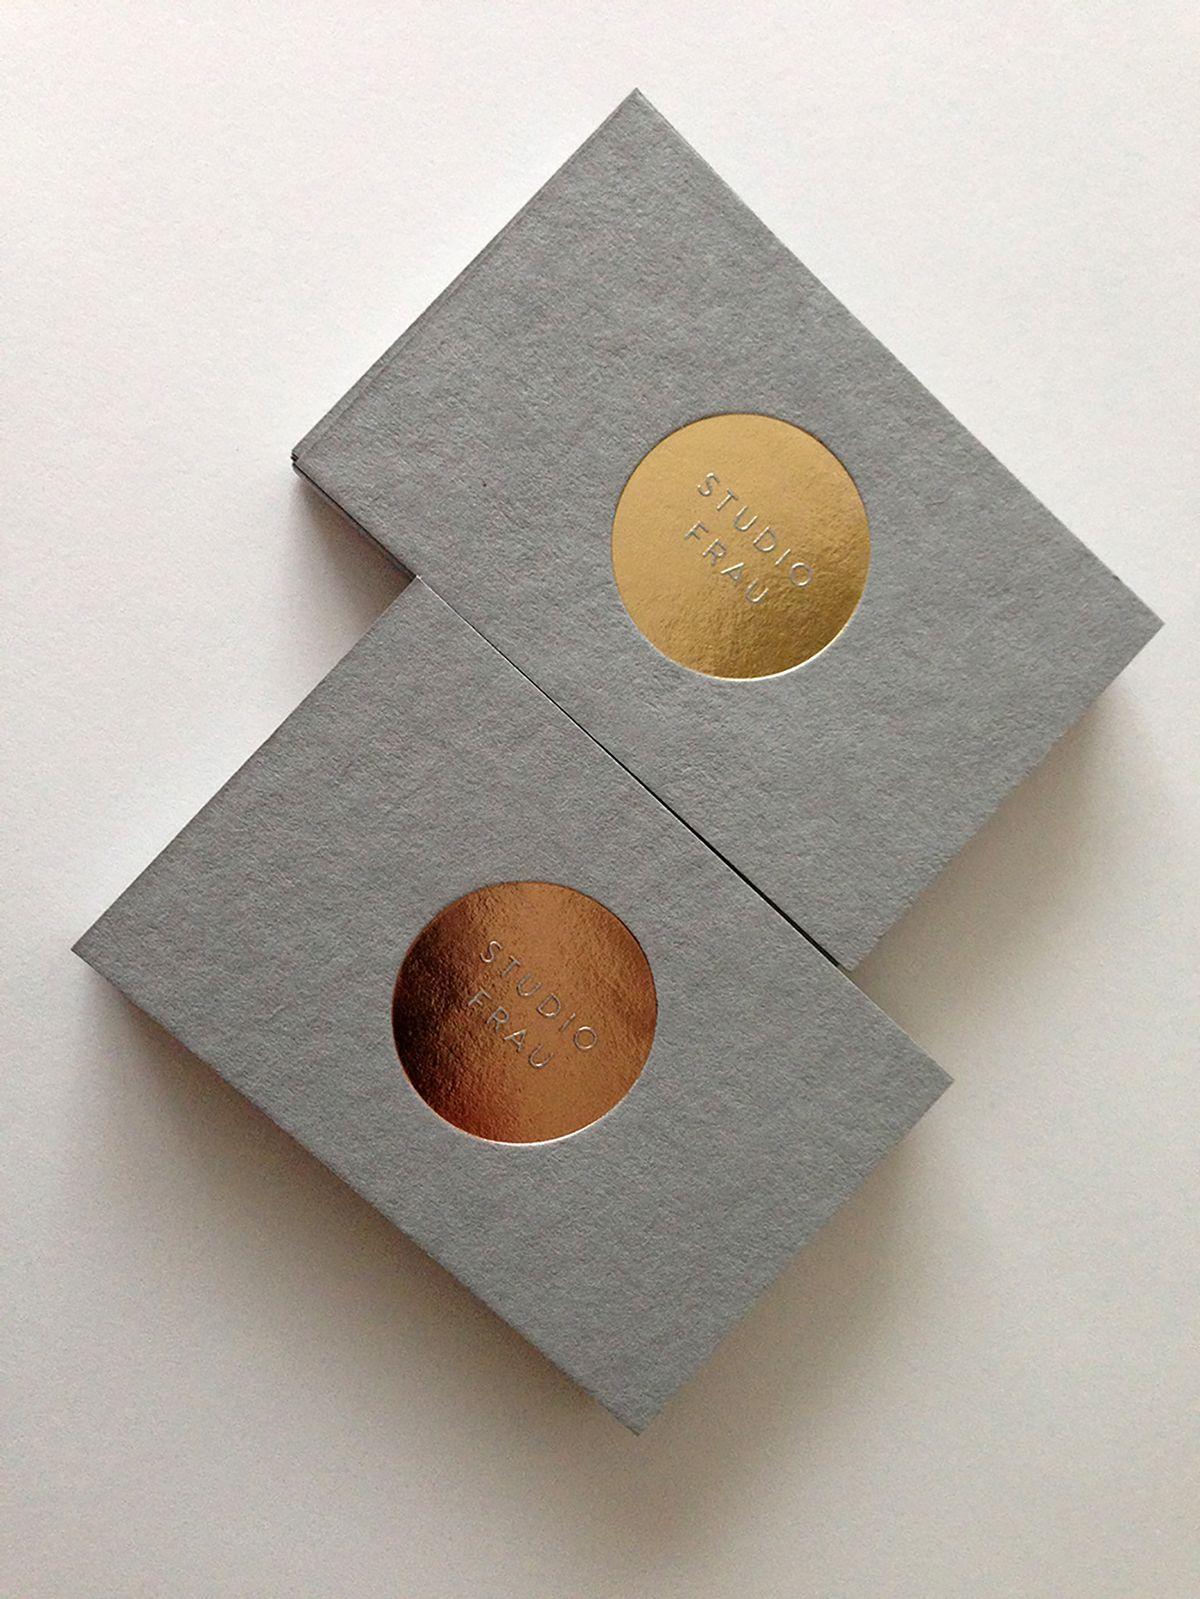 Studio frau business cards on behance interessantes for Visitenkarten ideen